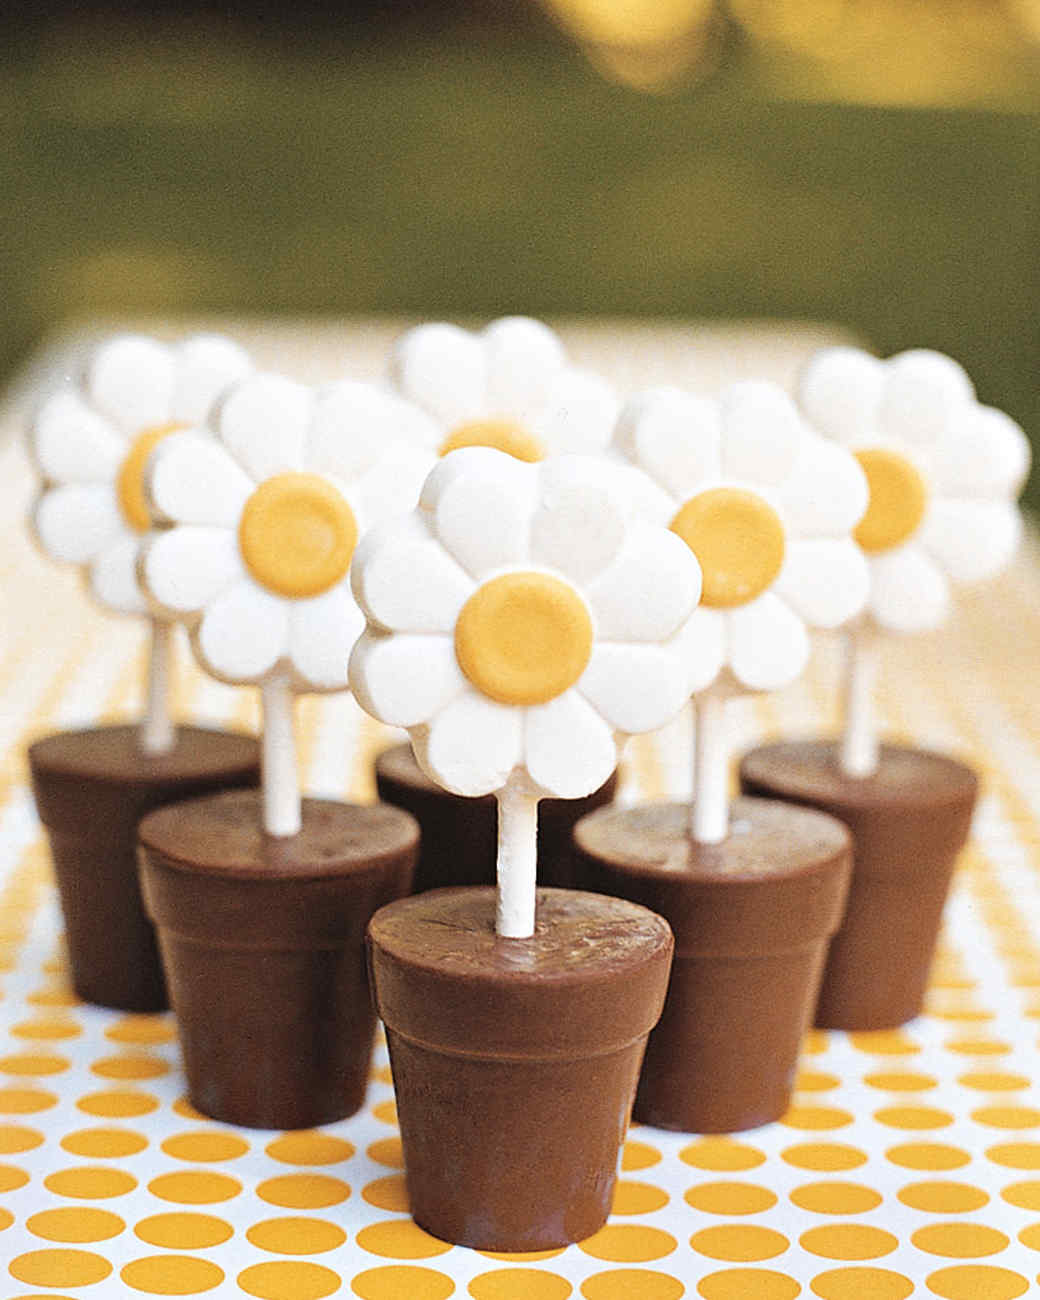 daisys-birthday-ma101007-candy02.jpg